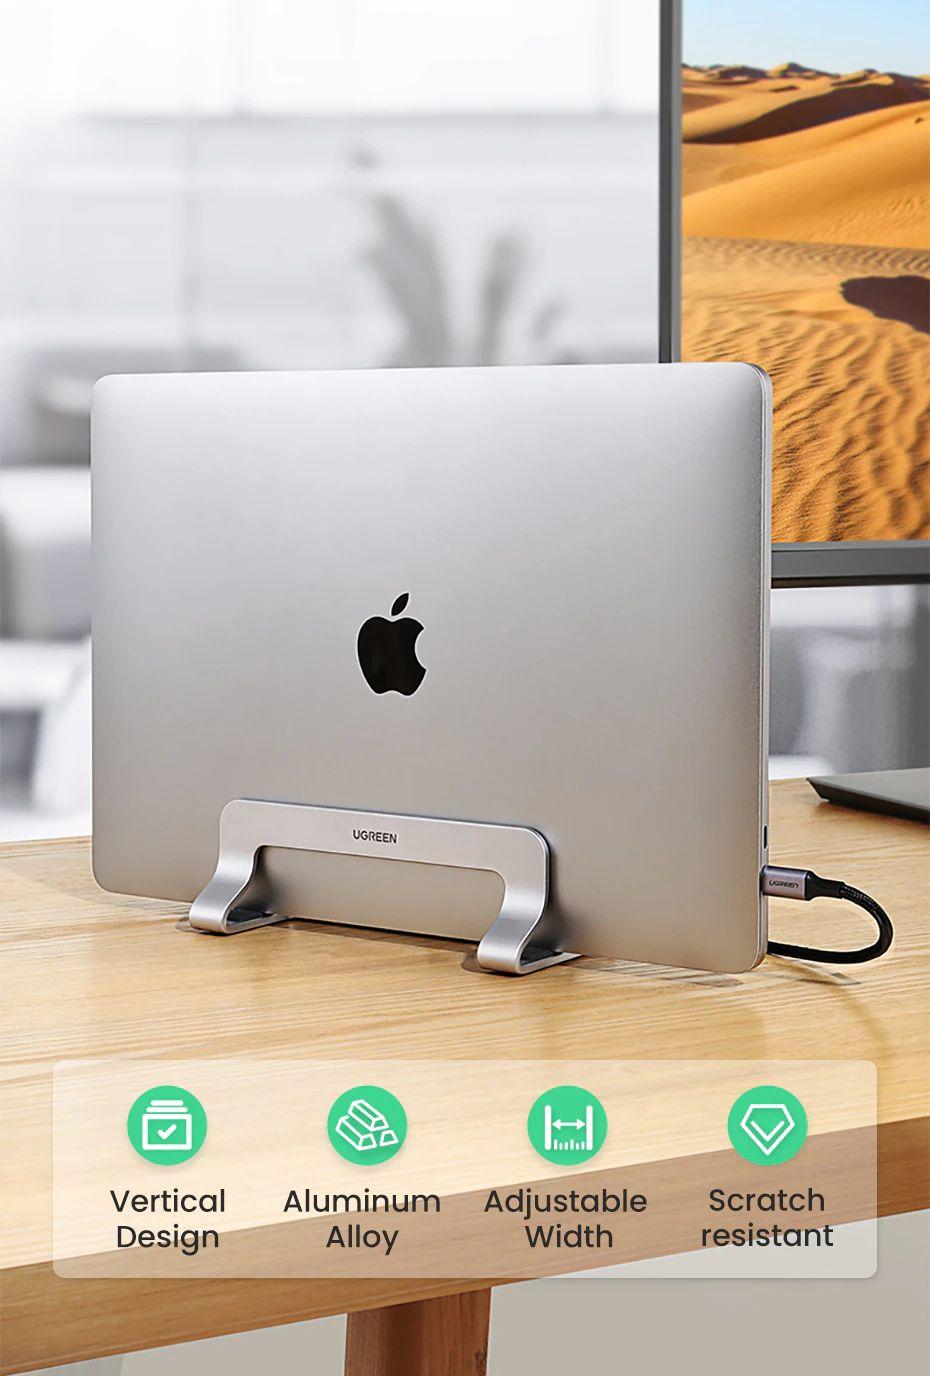 Ugreen Vertical Laptop Stand Holder Aluminum Adjustable Stand (2)